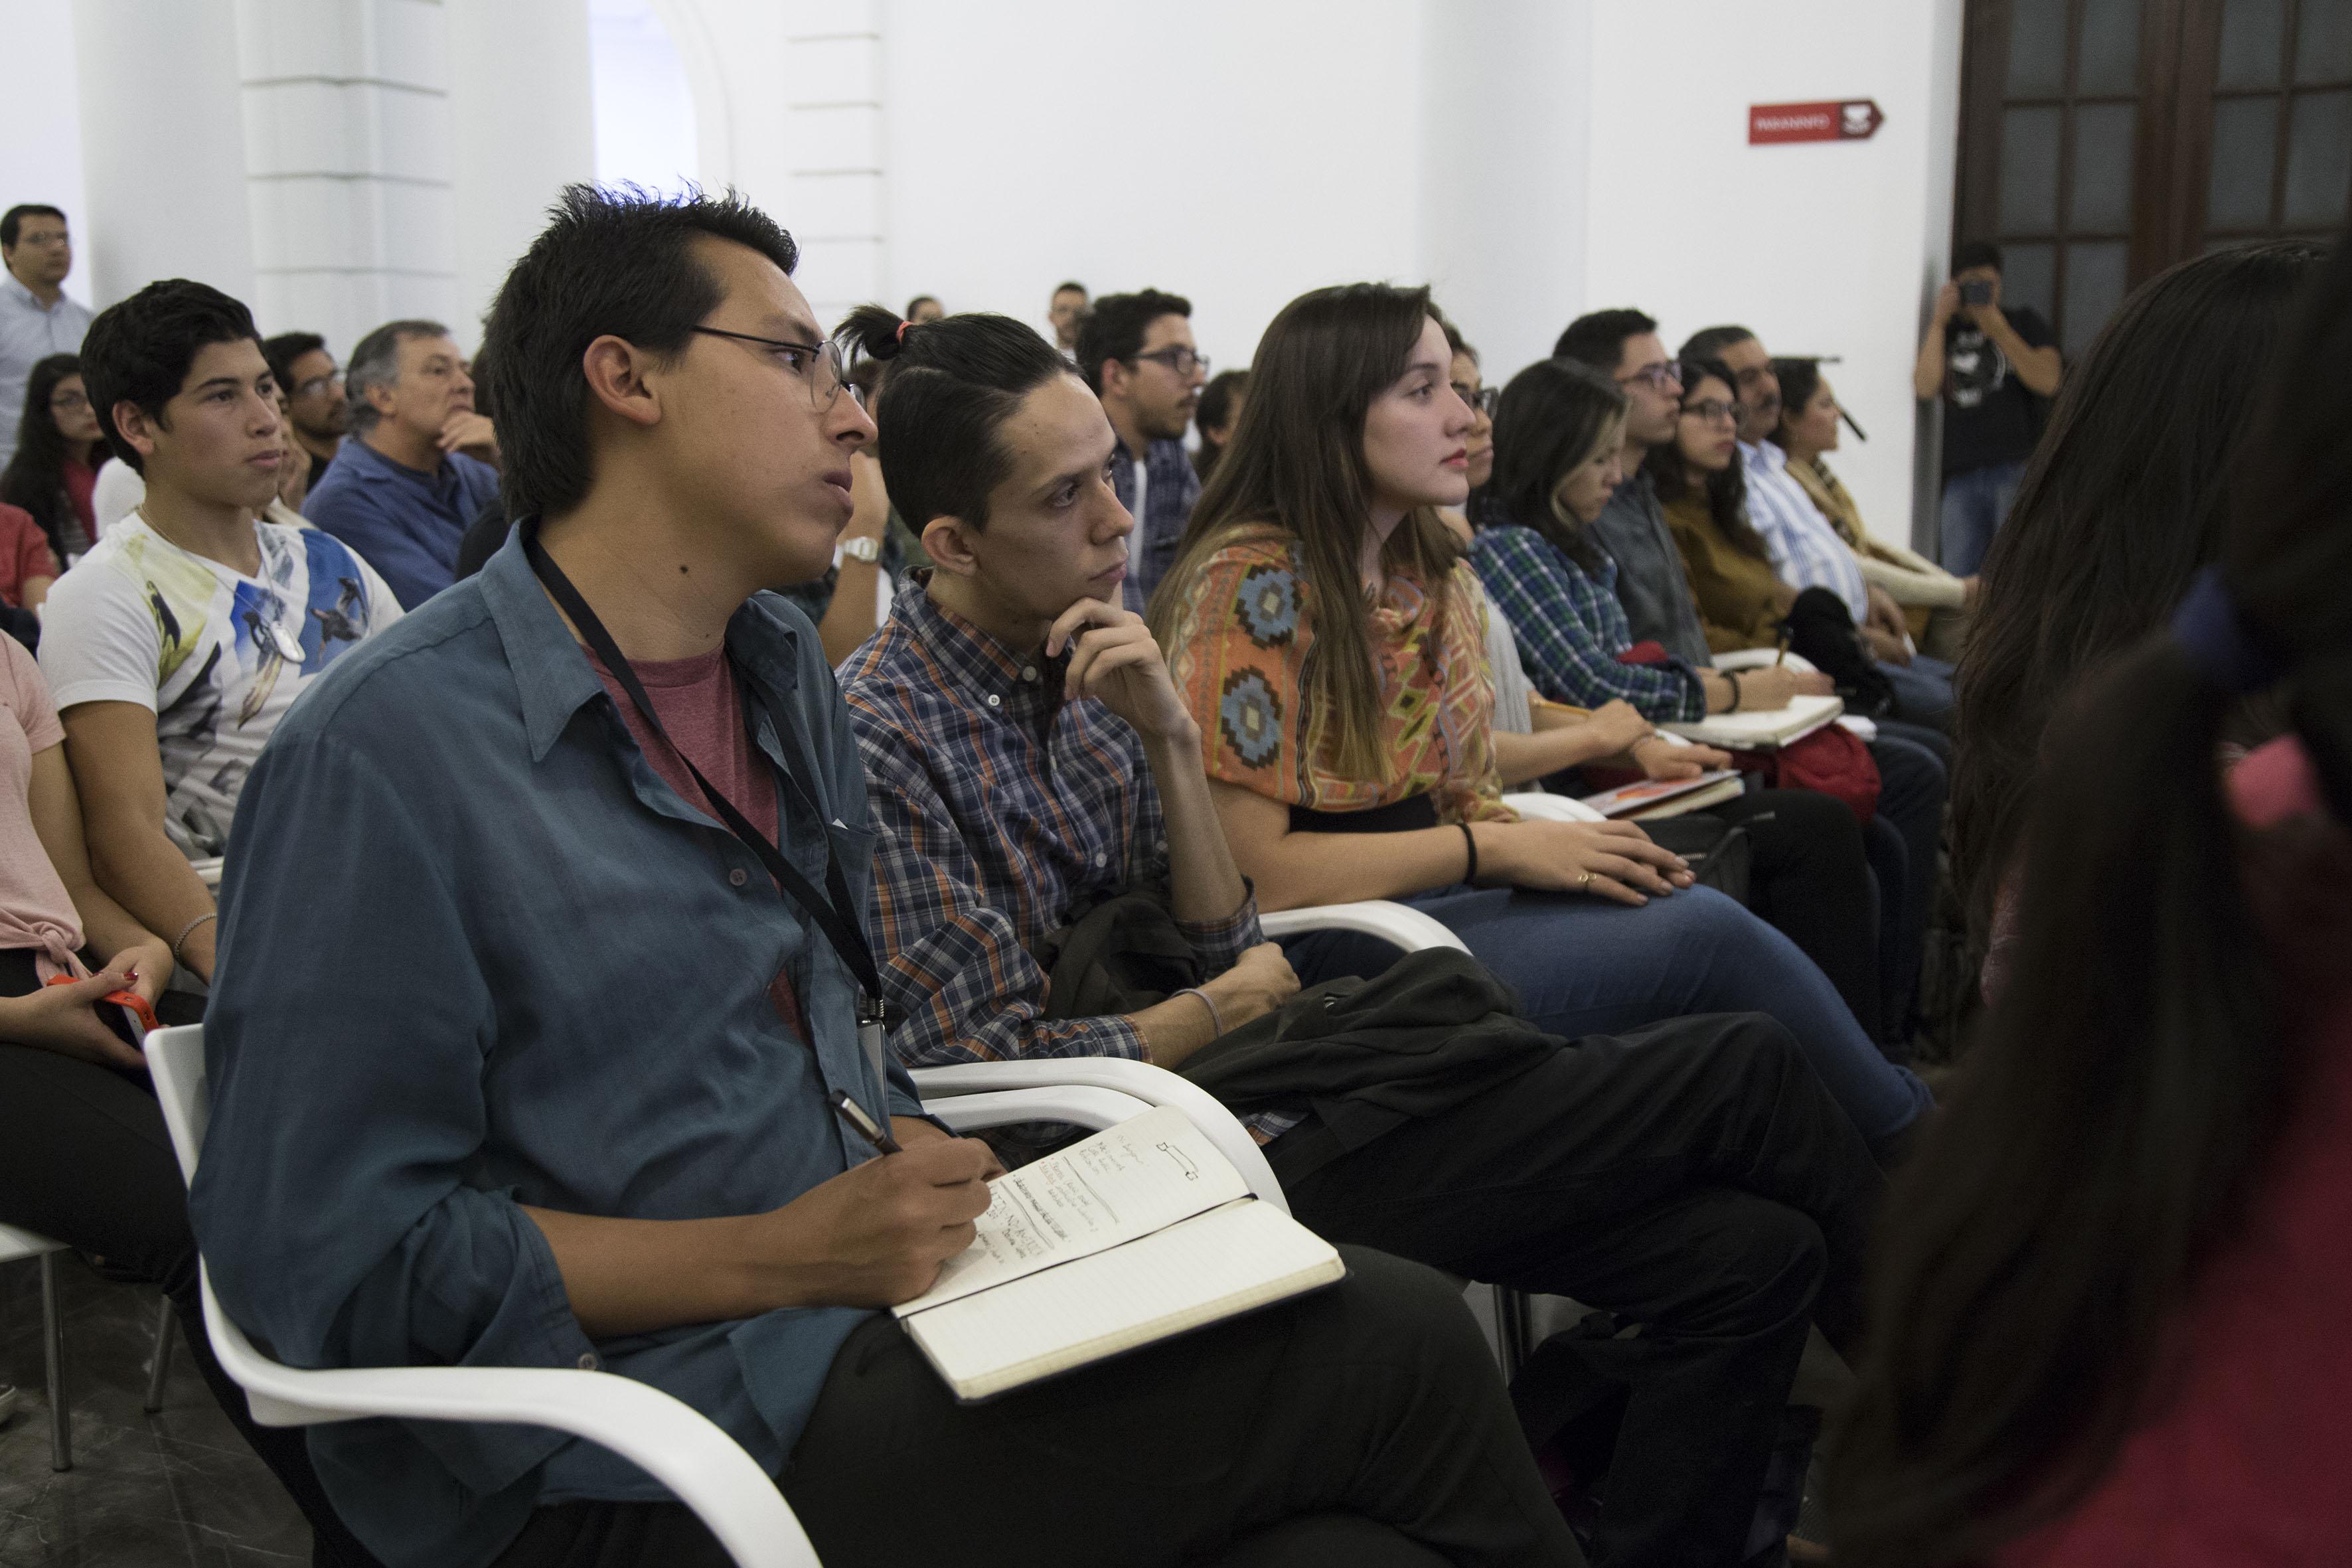 Académica analiza la cultura latinoamericana en el arte ...